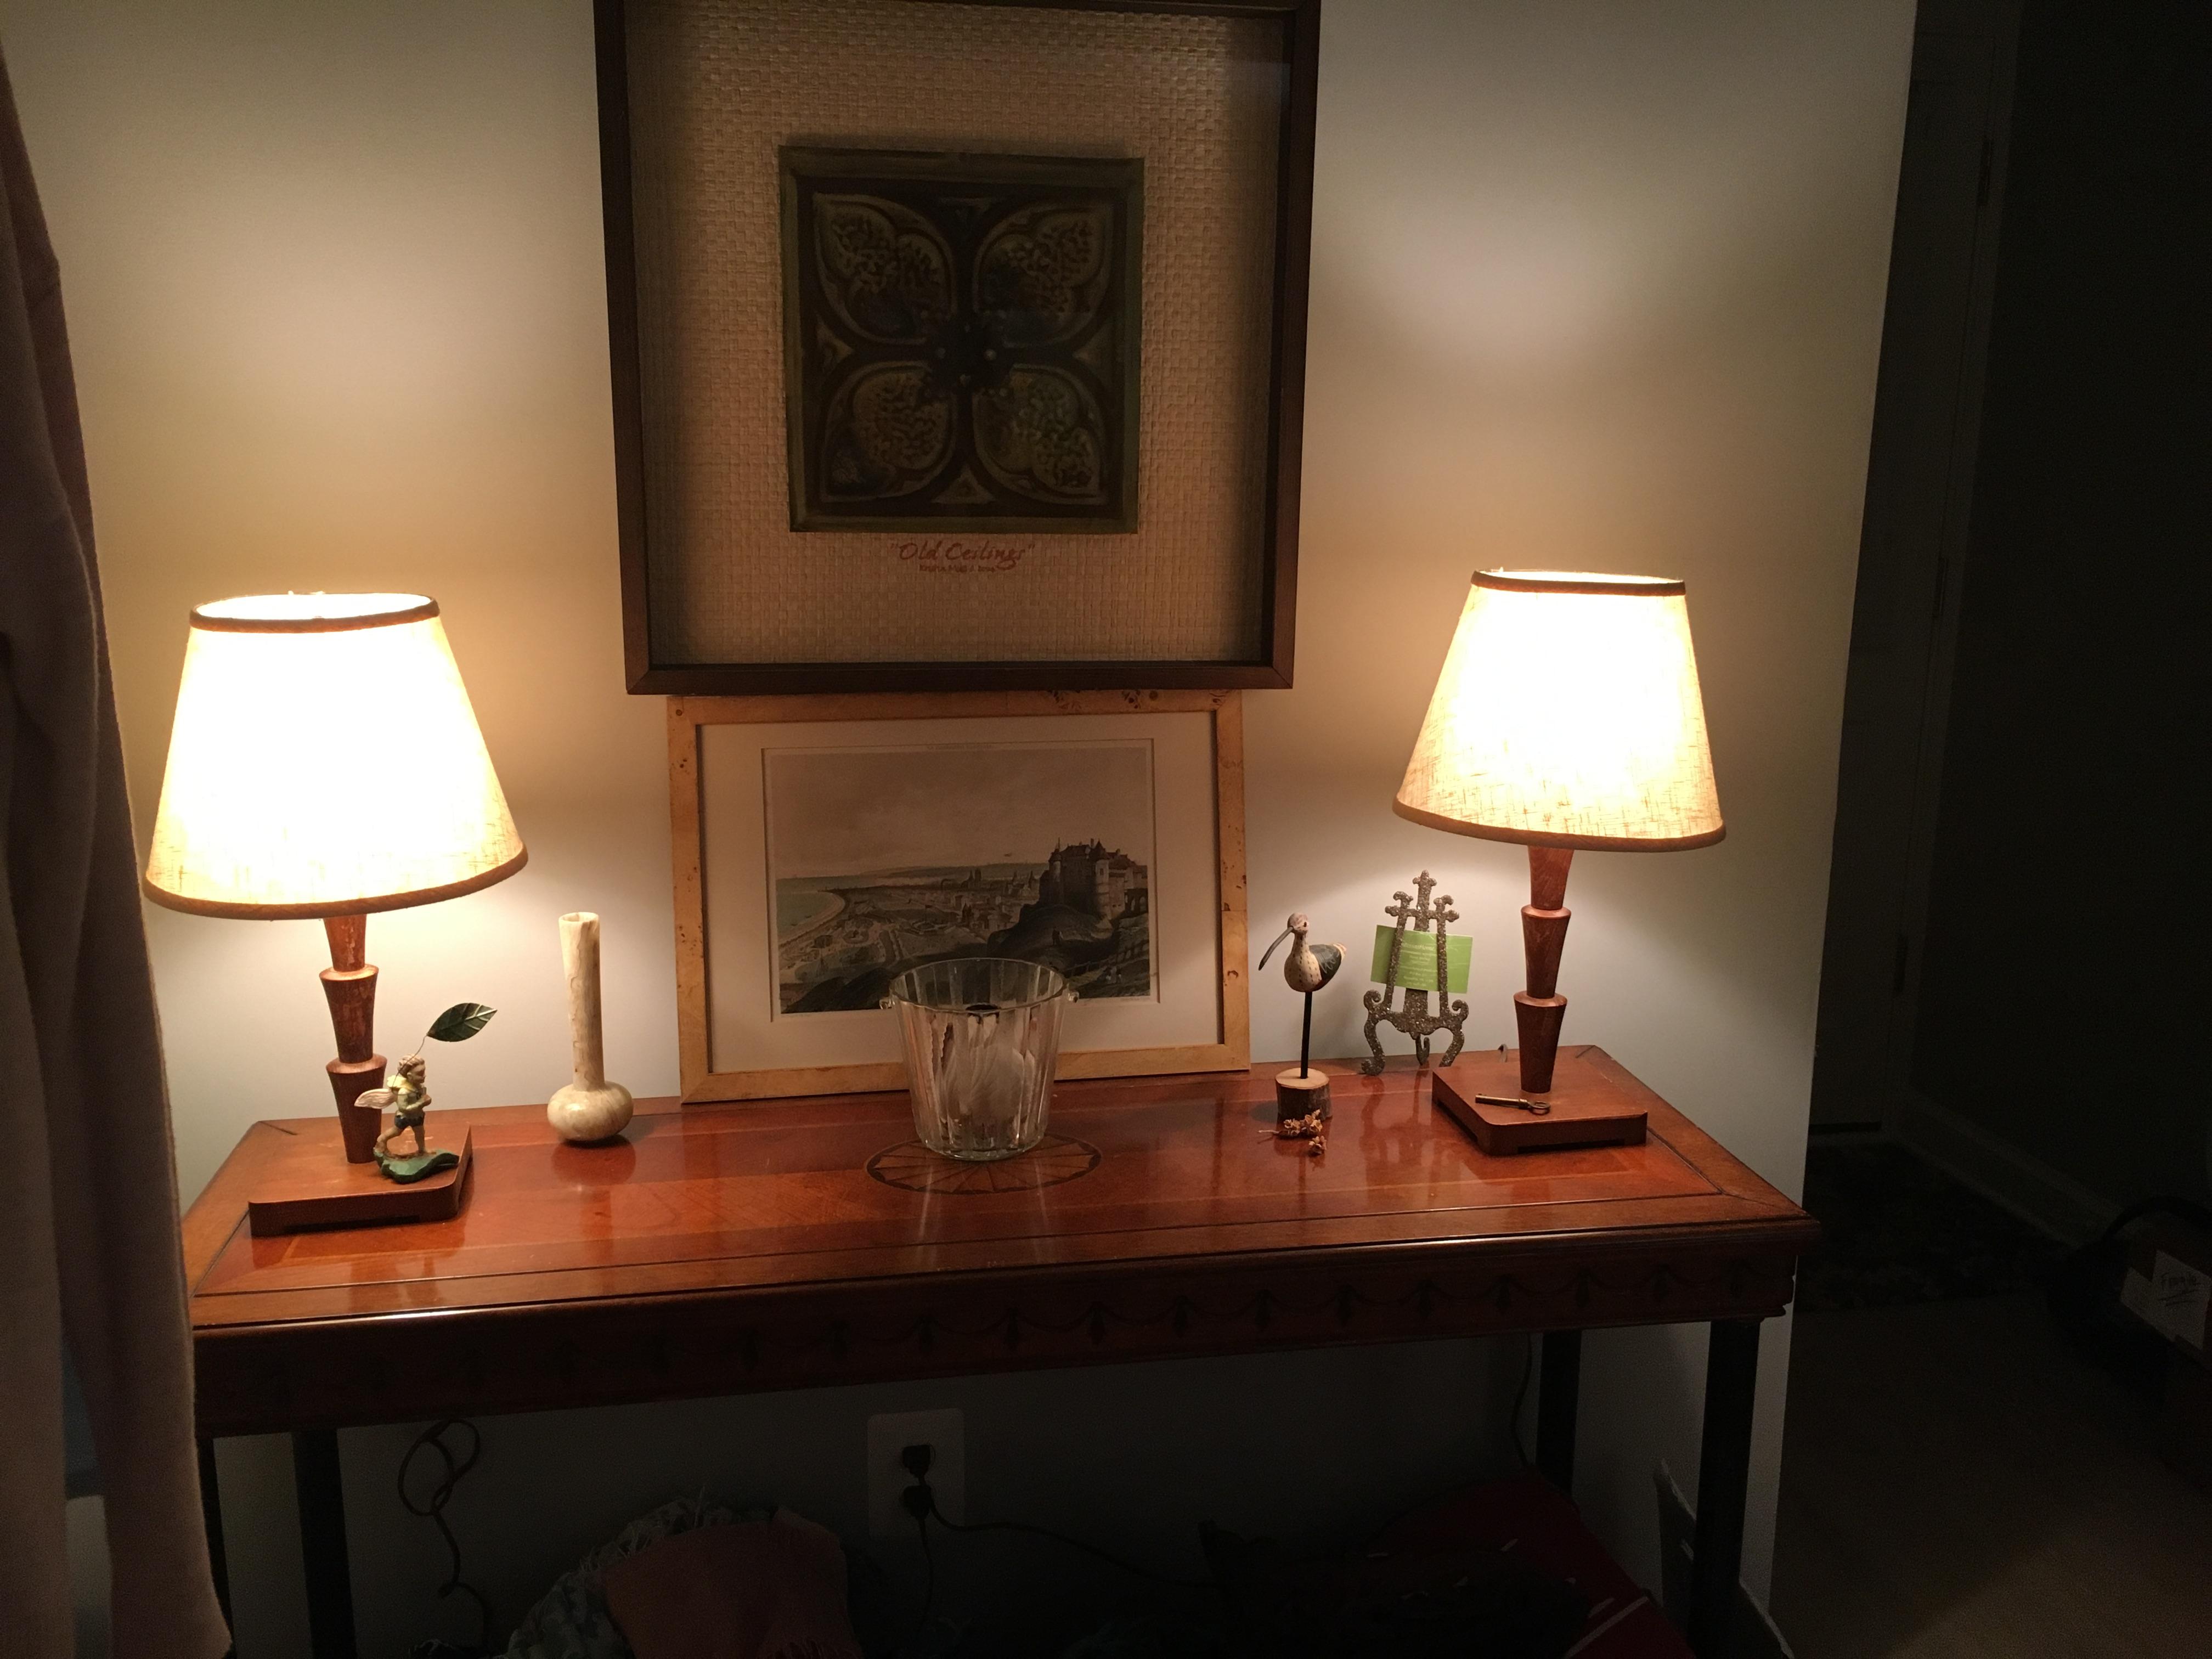 vintage industrial ebay uk lamps brass floor wooden table lamp etsy style